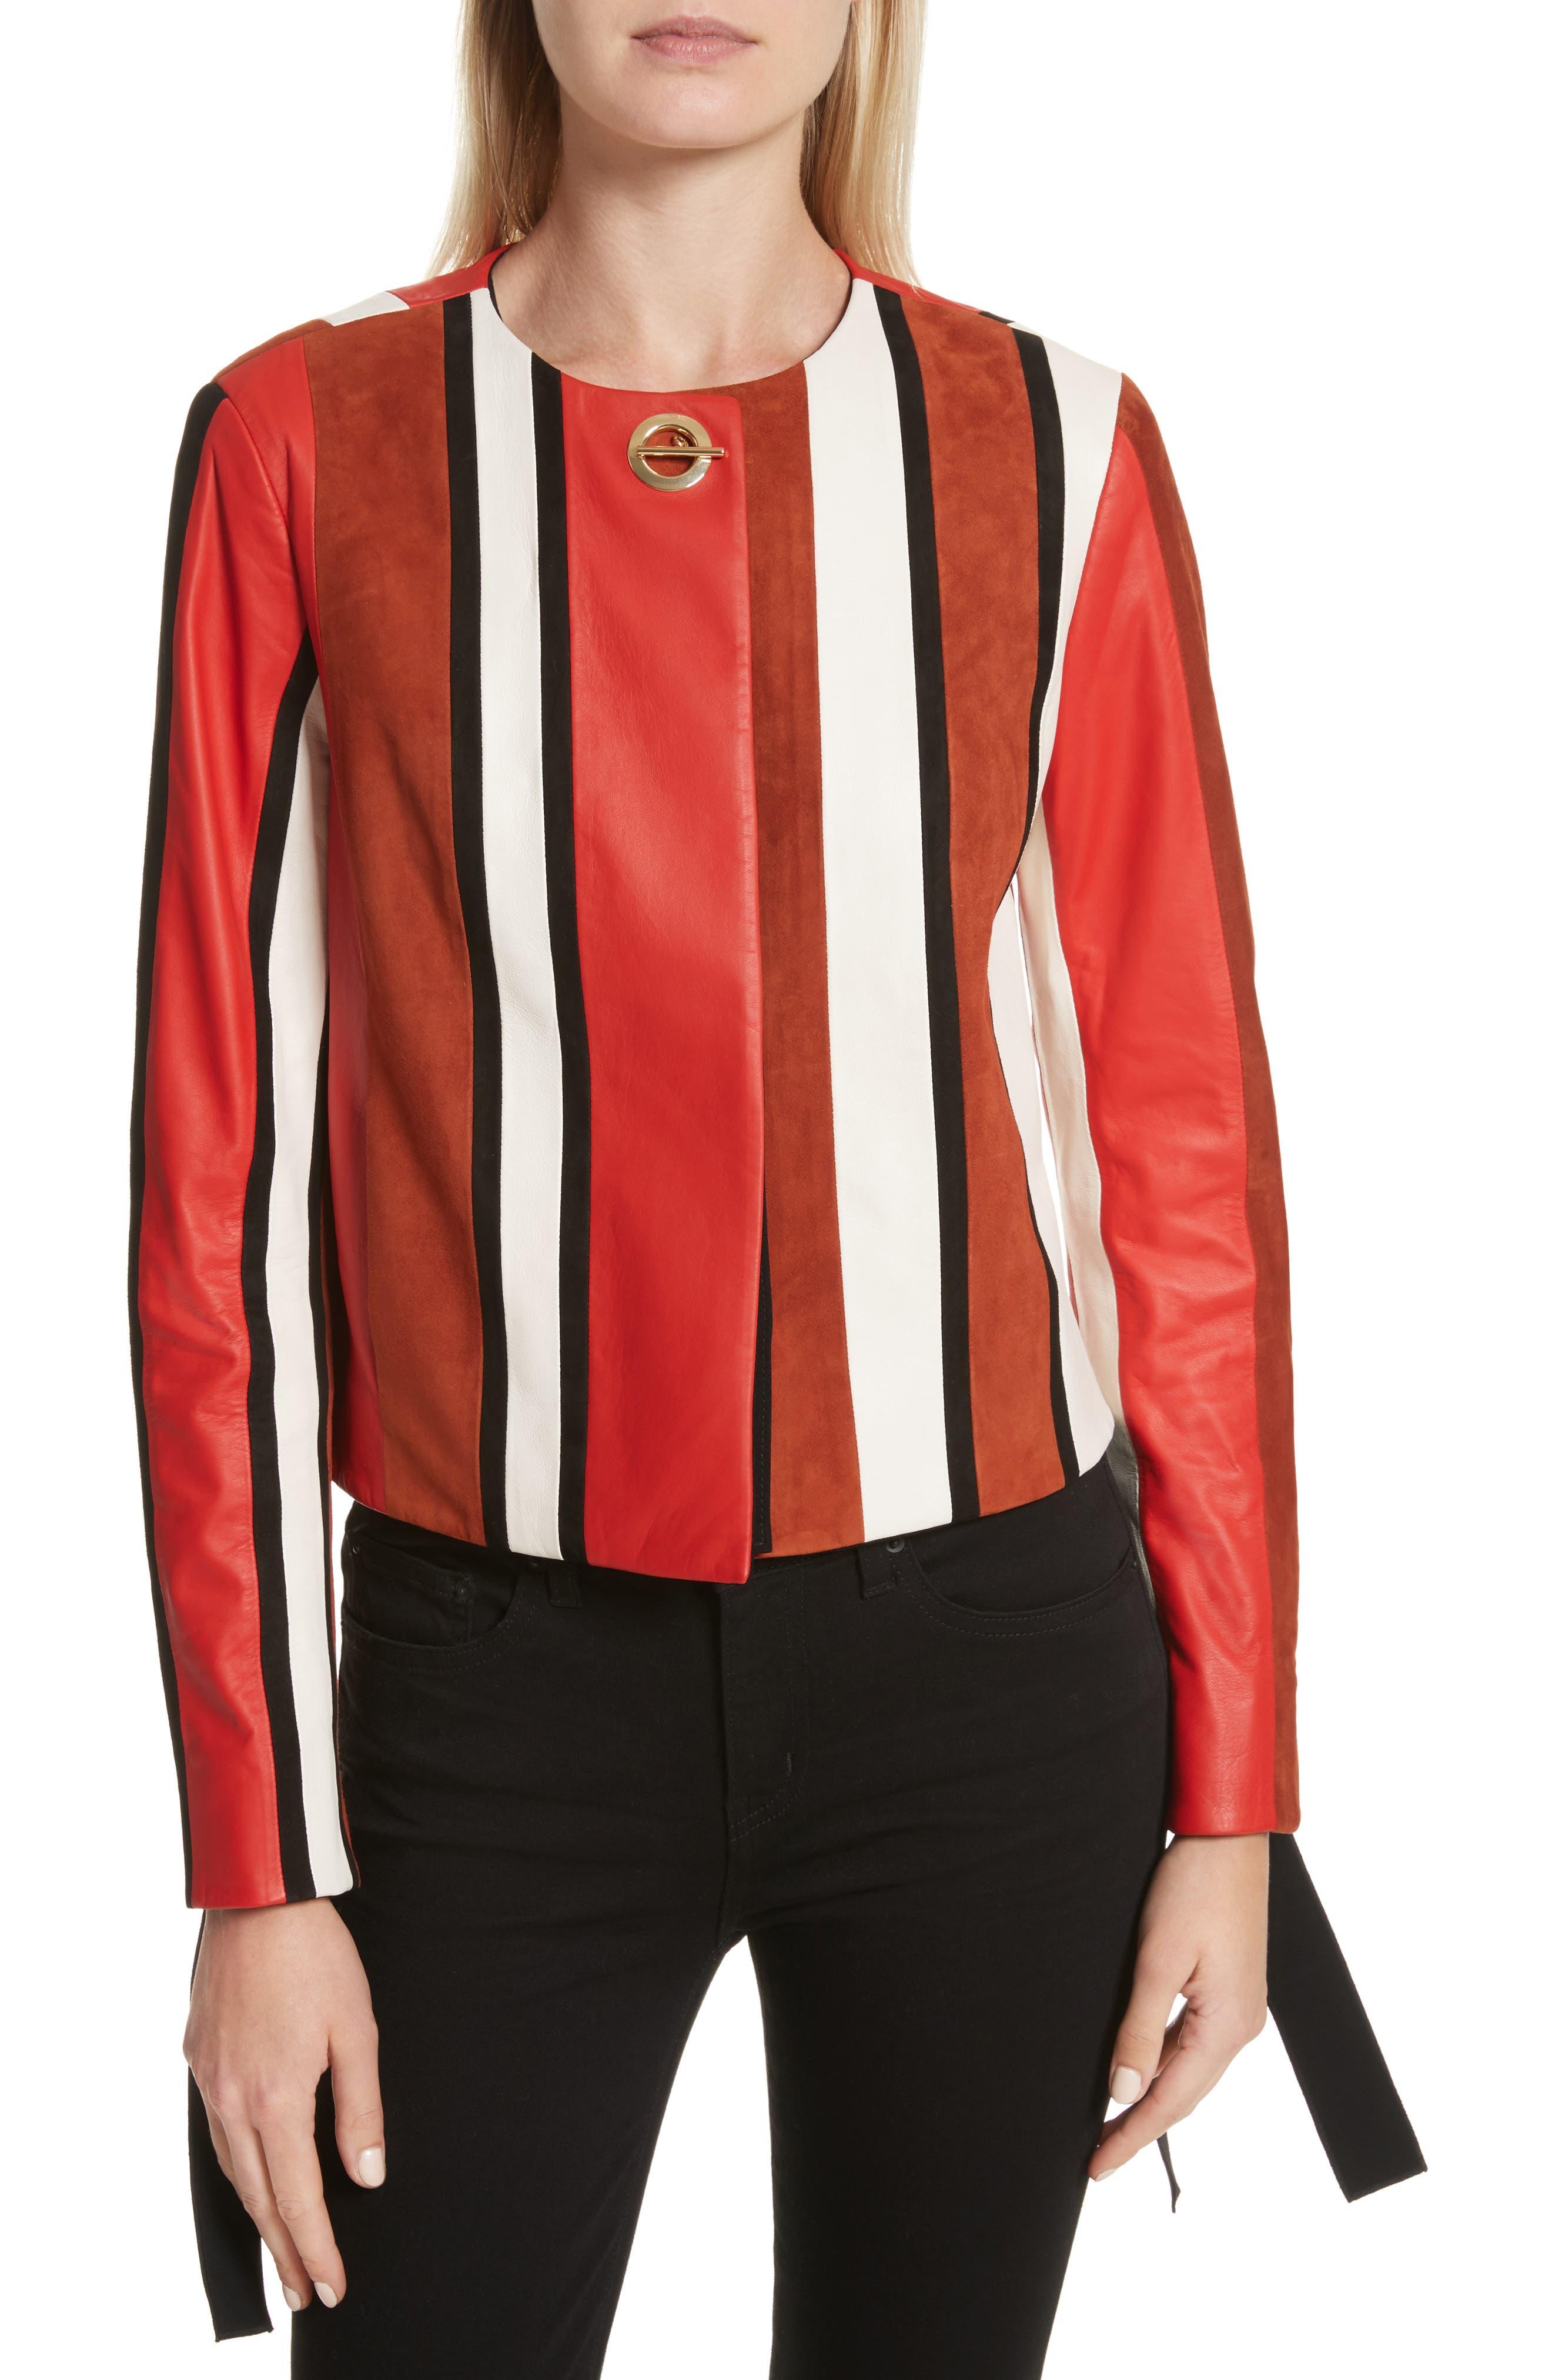 Main Image - Derek Lam 10 Crosby Stripe Collarless Leather Jacket